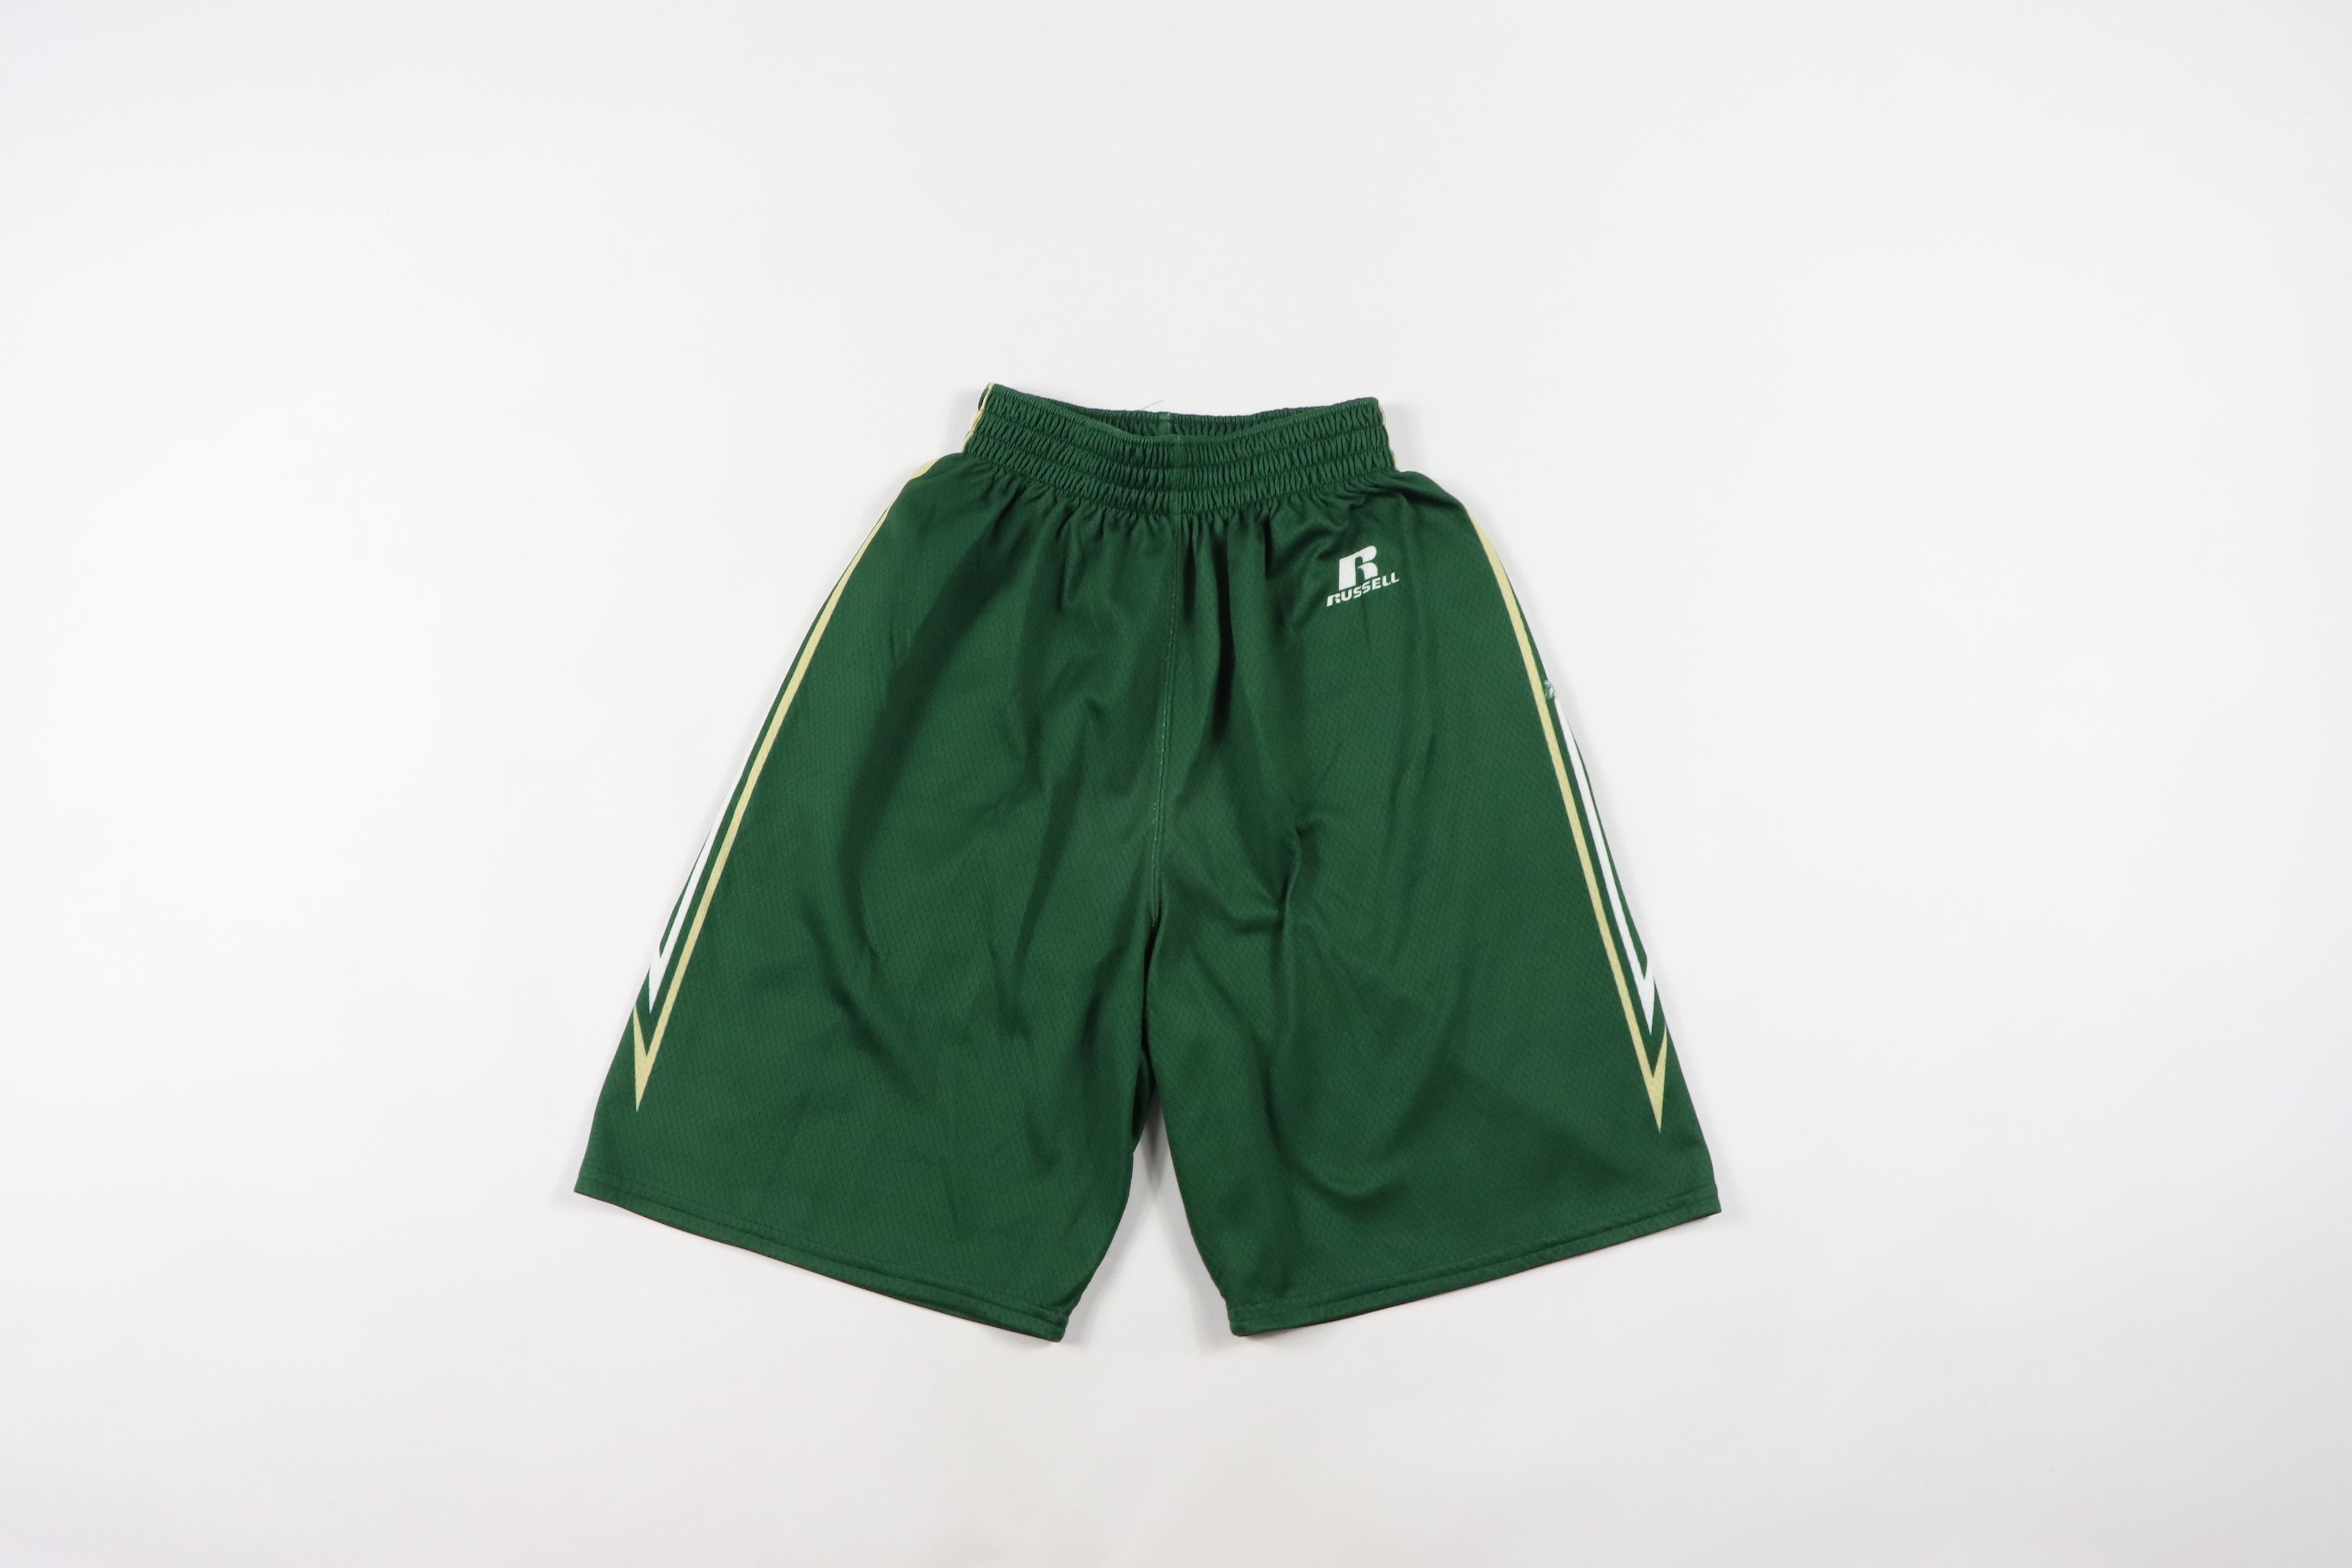 russell basketball shorts